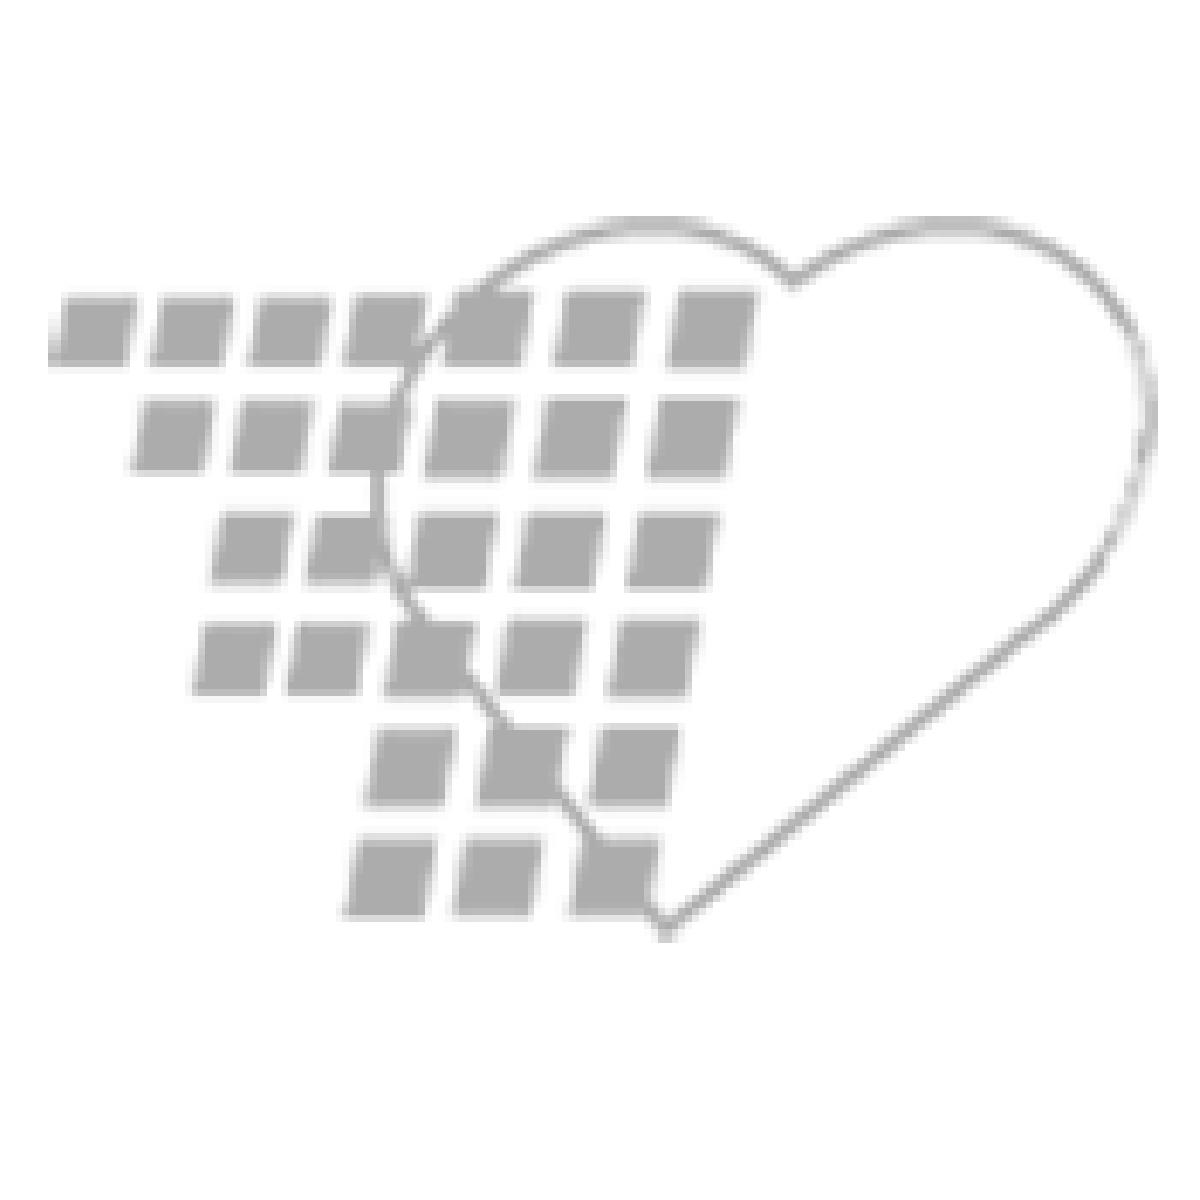 05-44-0100 - Laerdal Stifneck® Baby No-Neck Collar